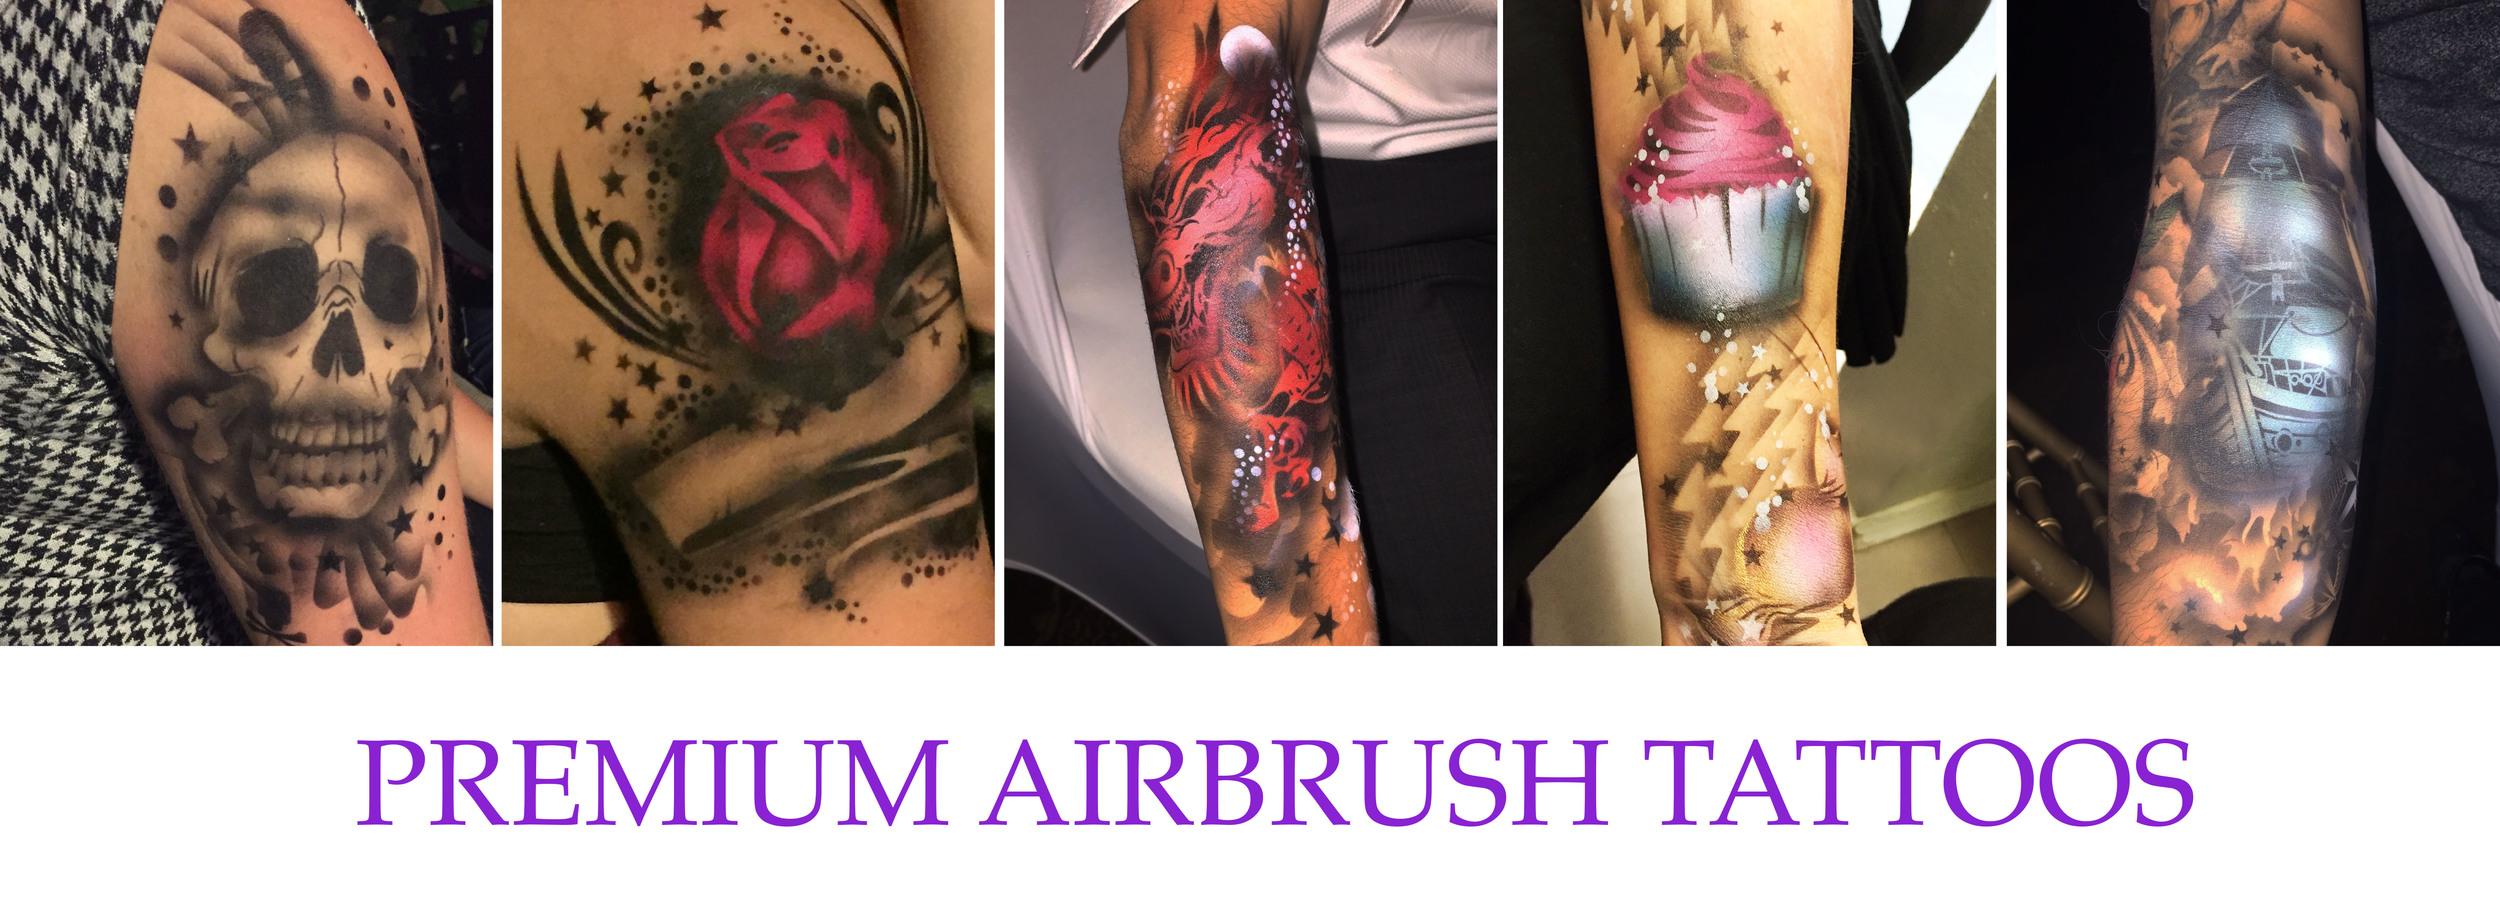 Premium Airbrush Tattoos We Adorn You.jpg